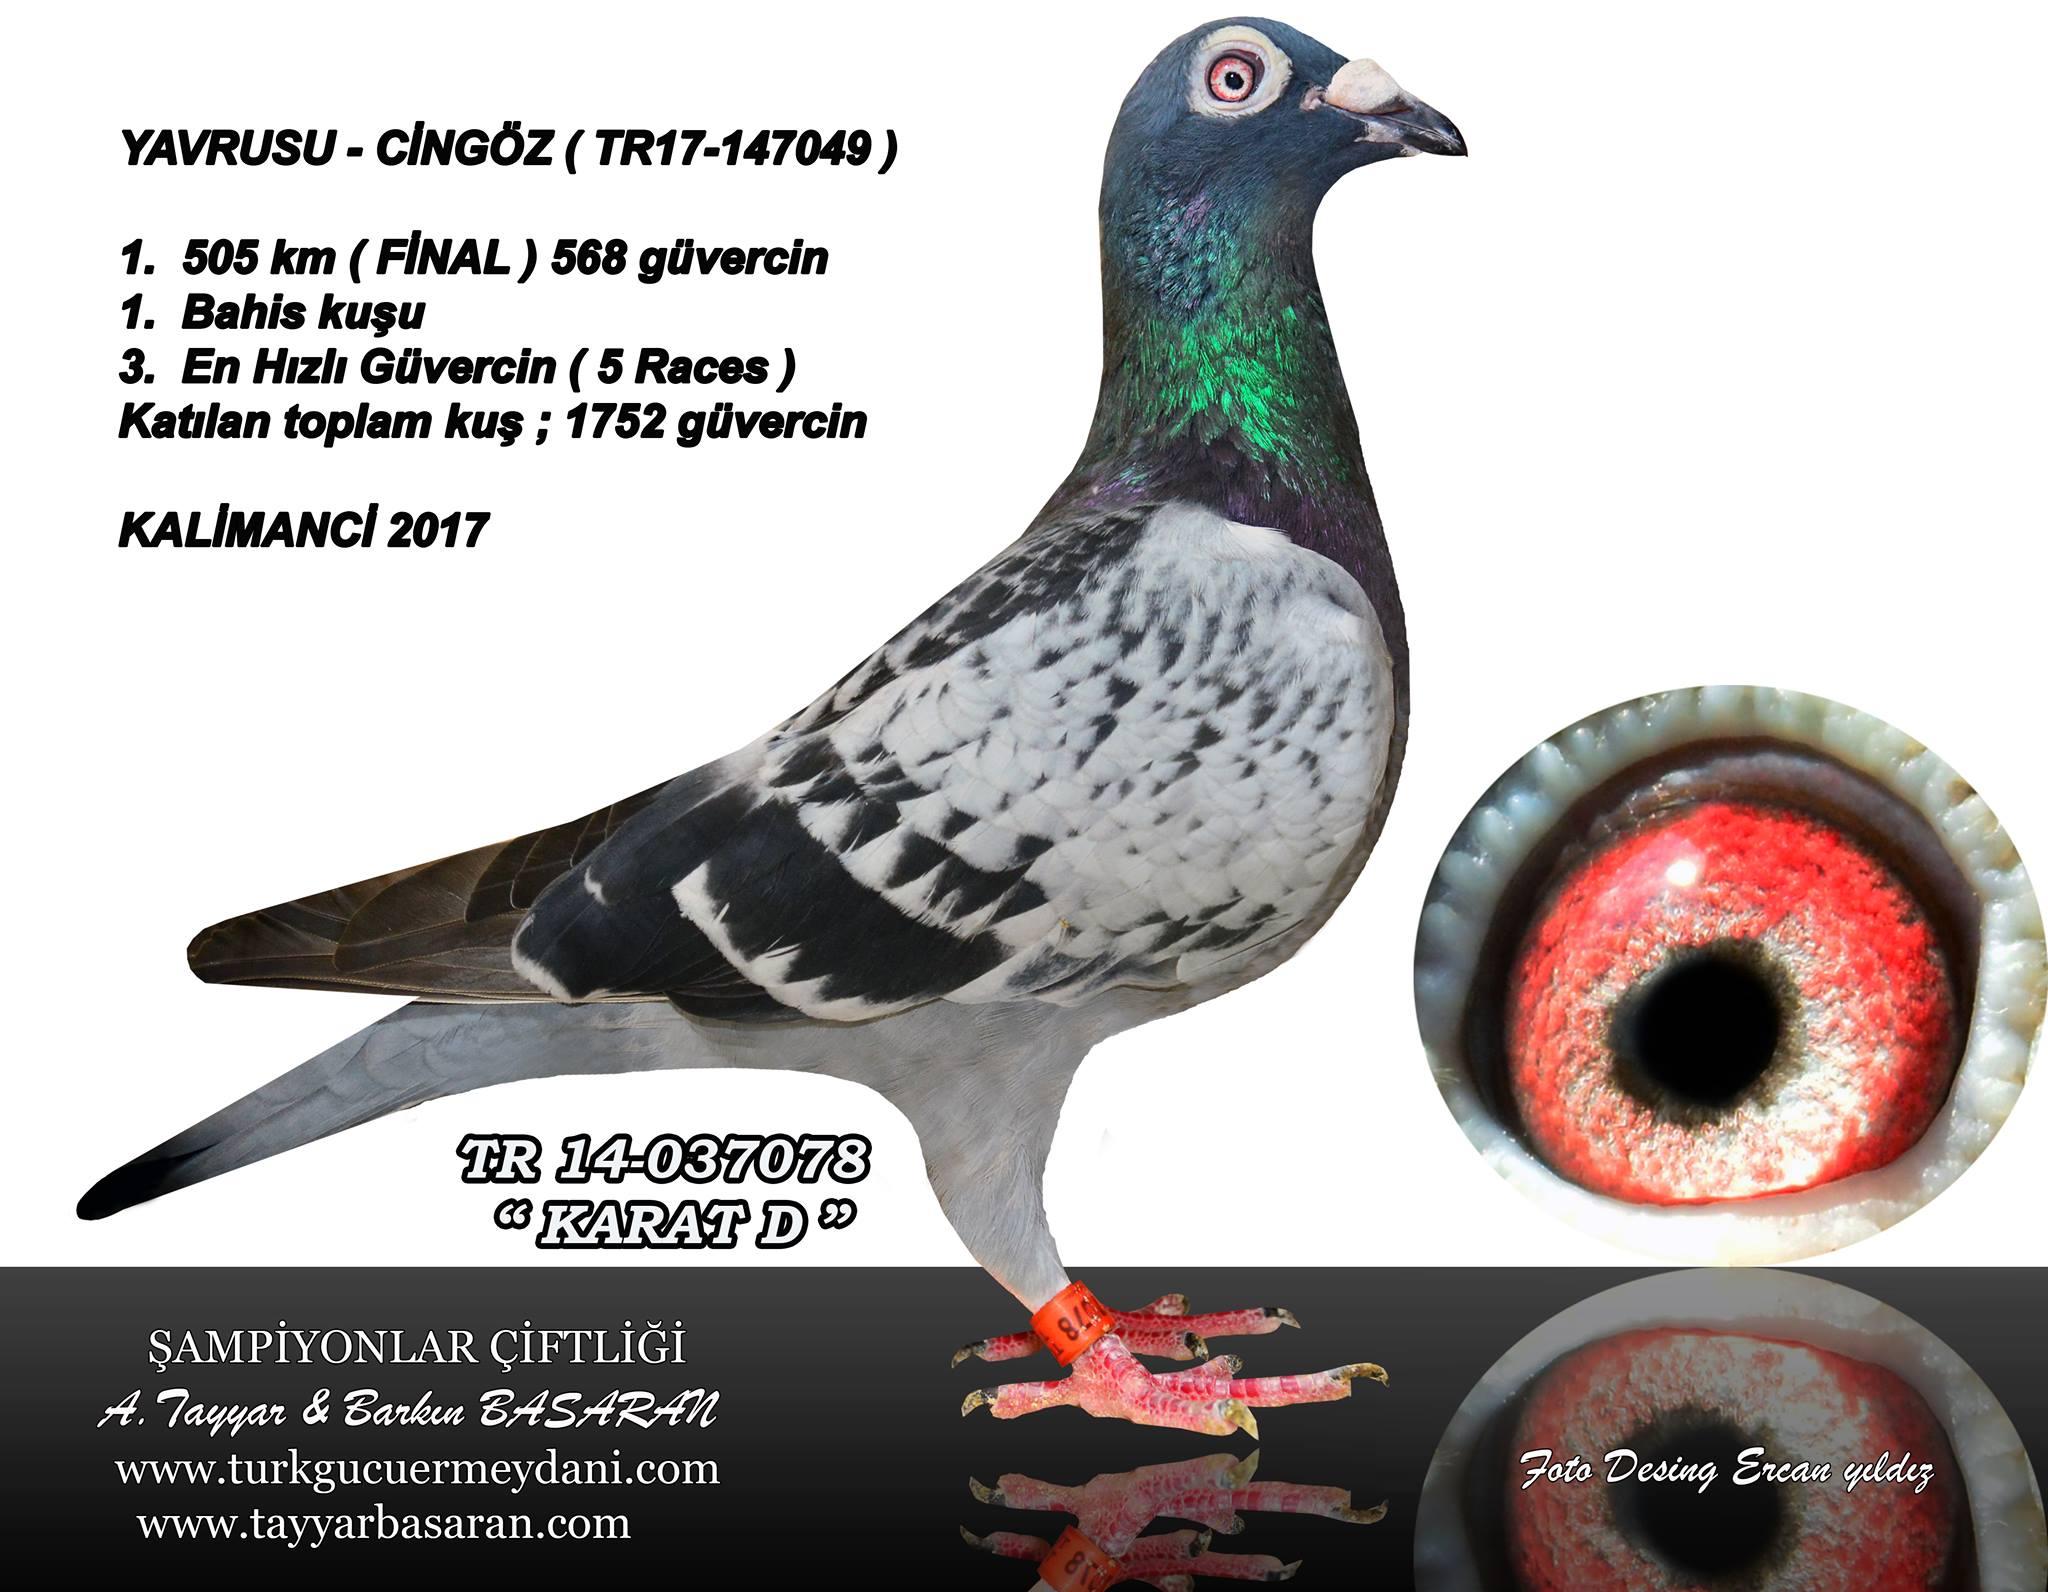 TR-18-206705 1.inci Kalimanci KIZ kardşi 2017